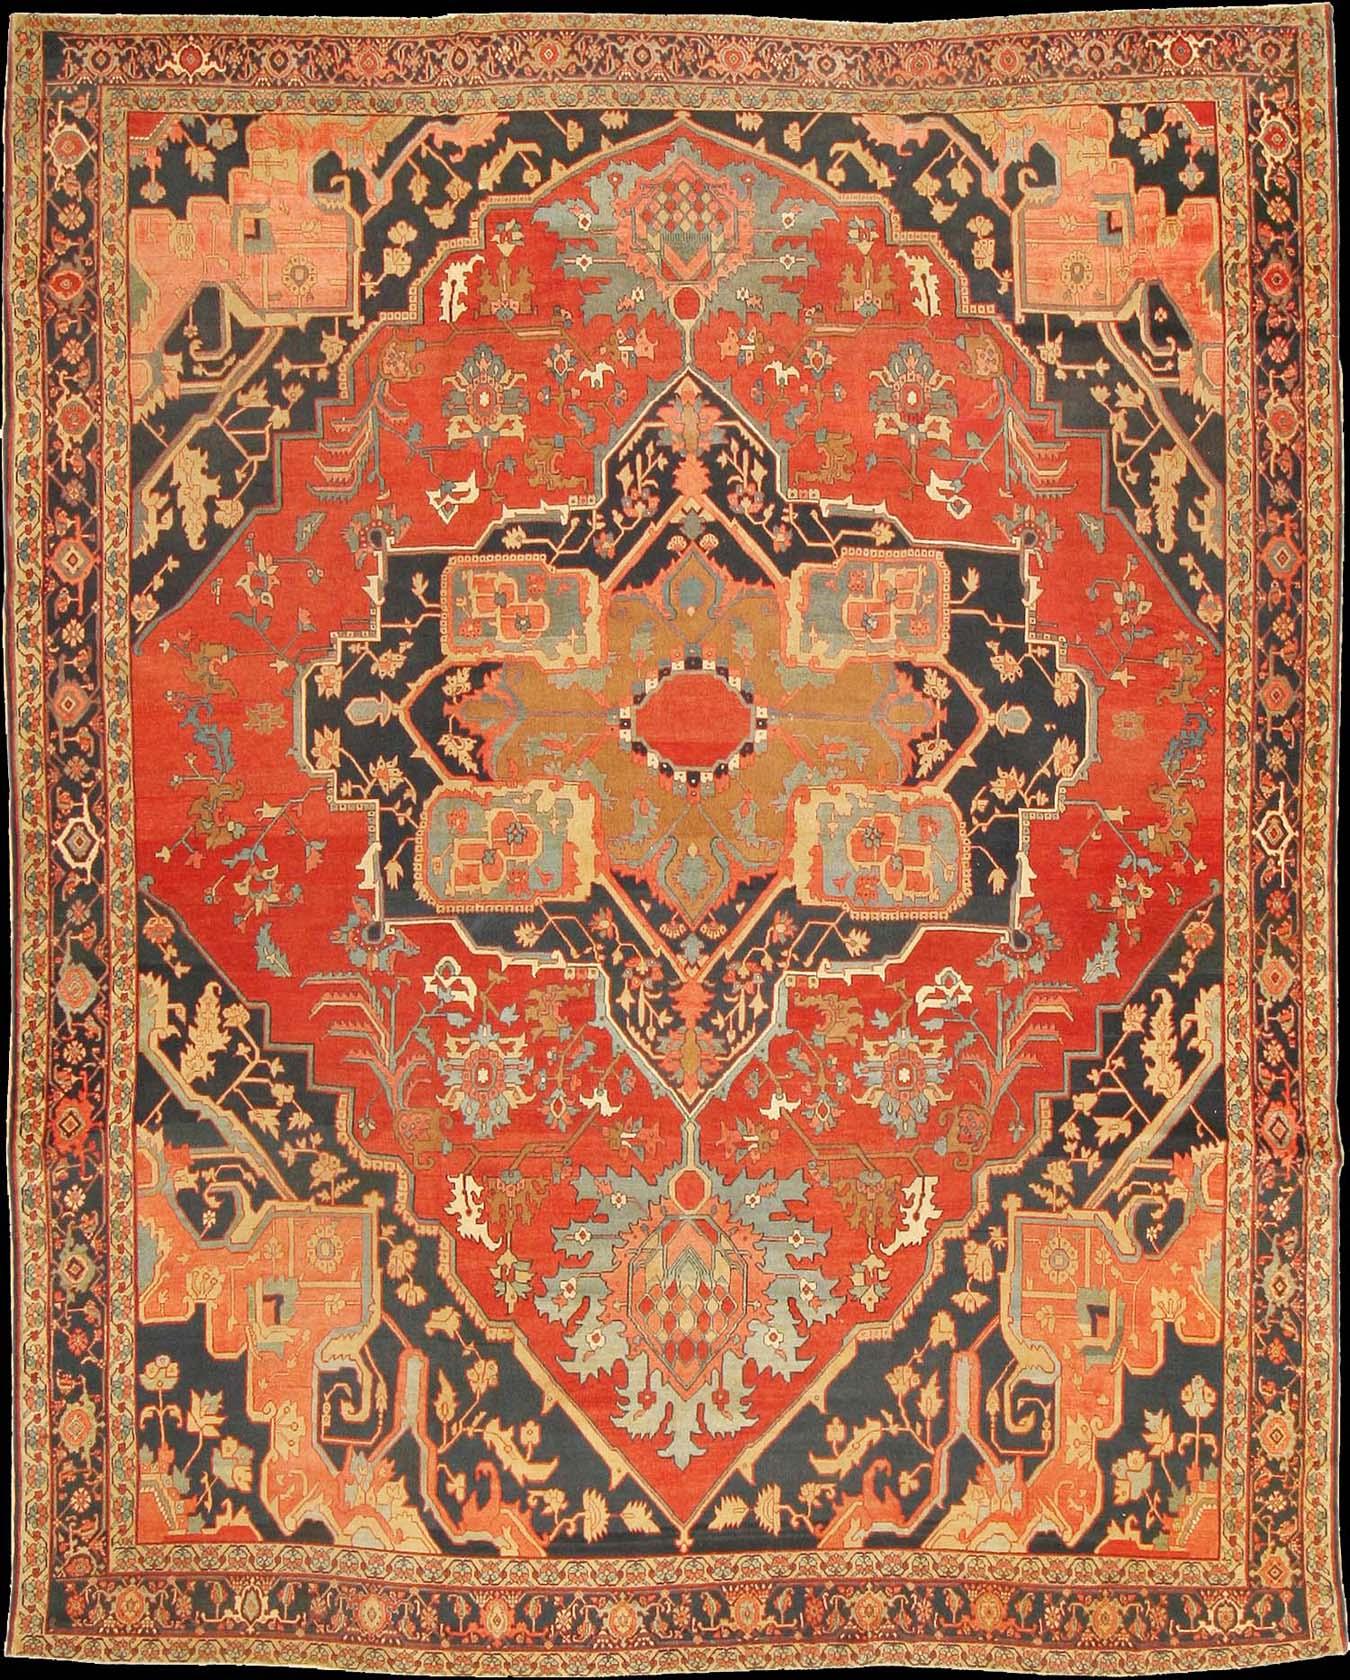 Persian Heriz Serapi Rug, c. 1900 Tappeti persiani